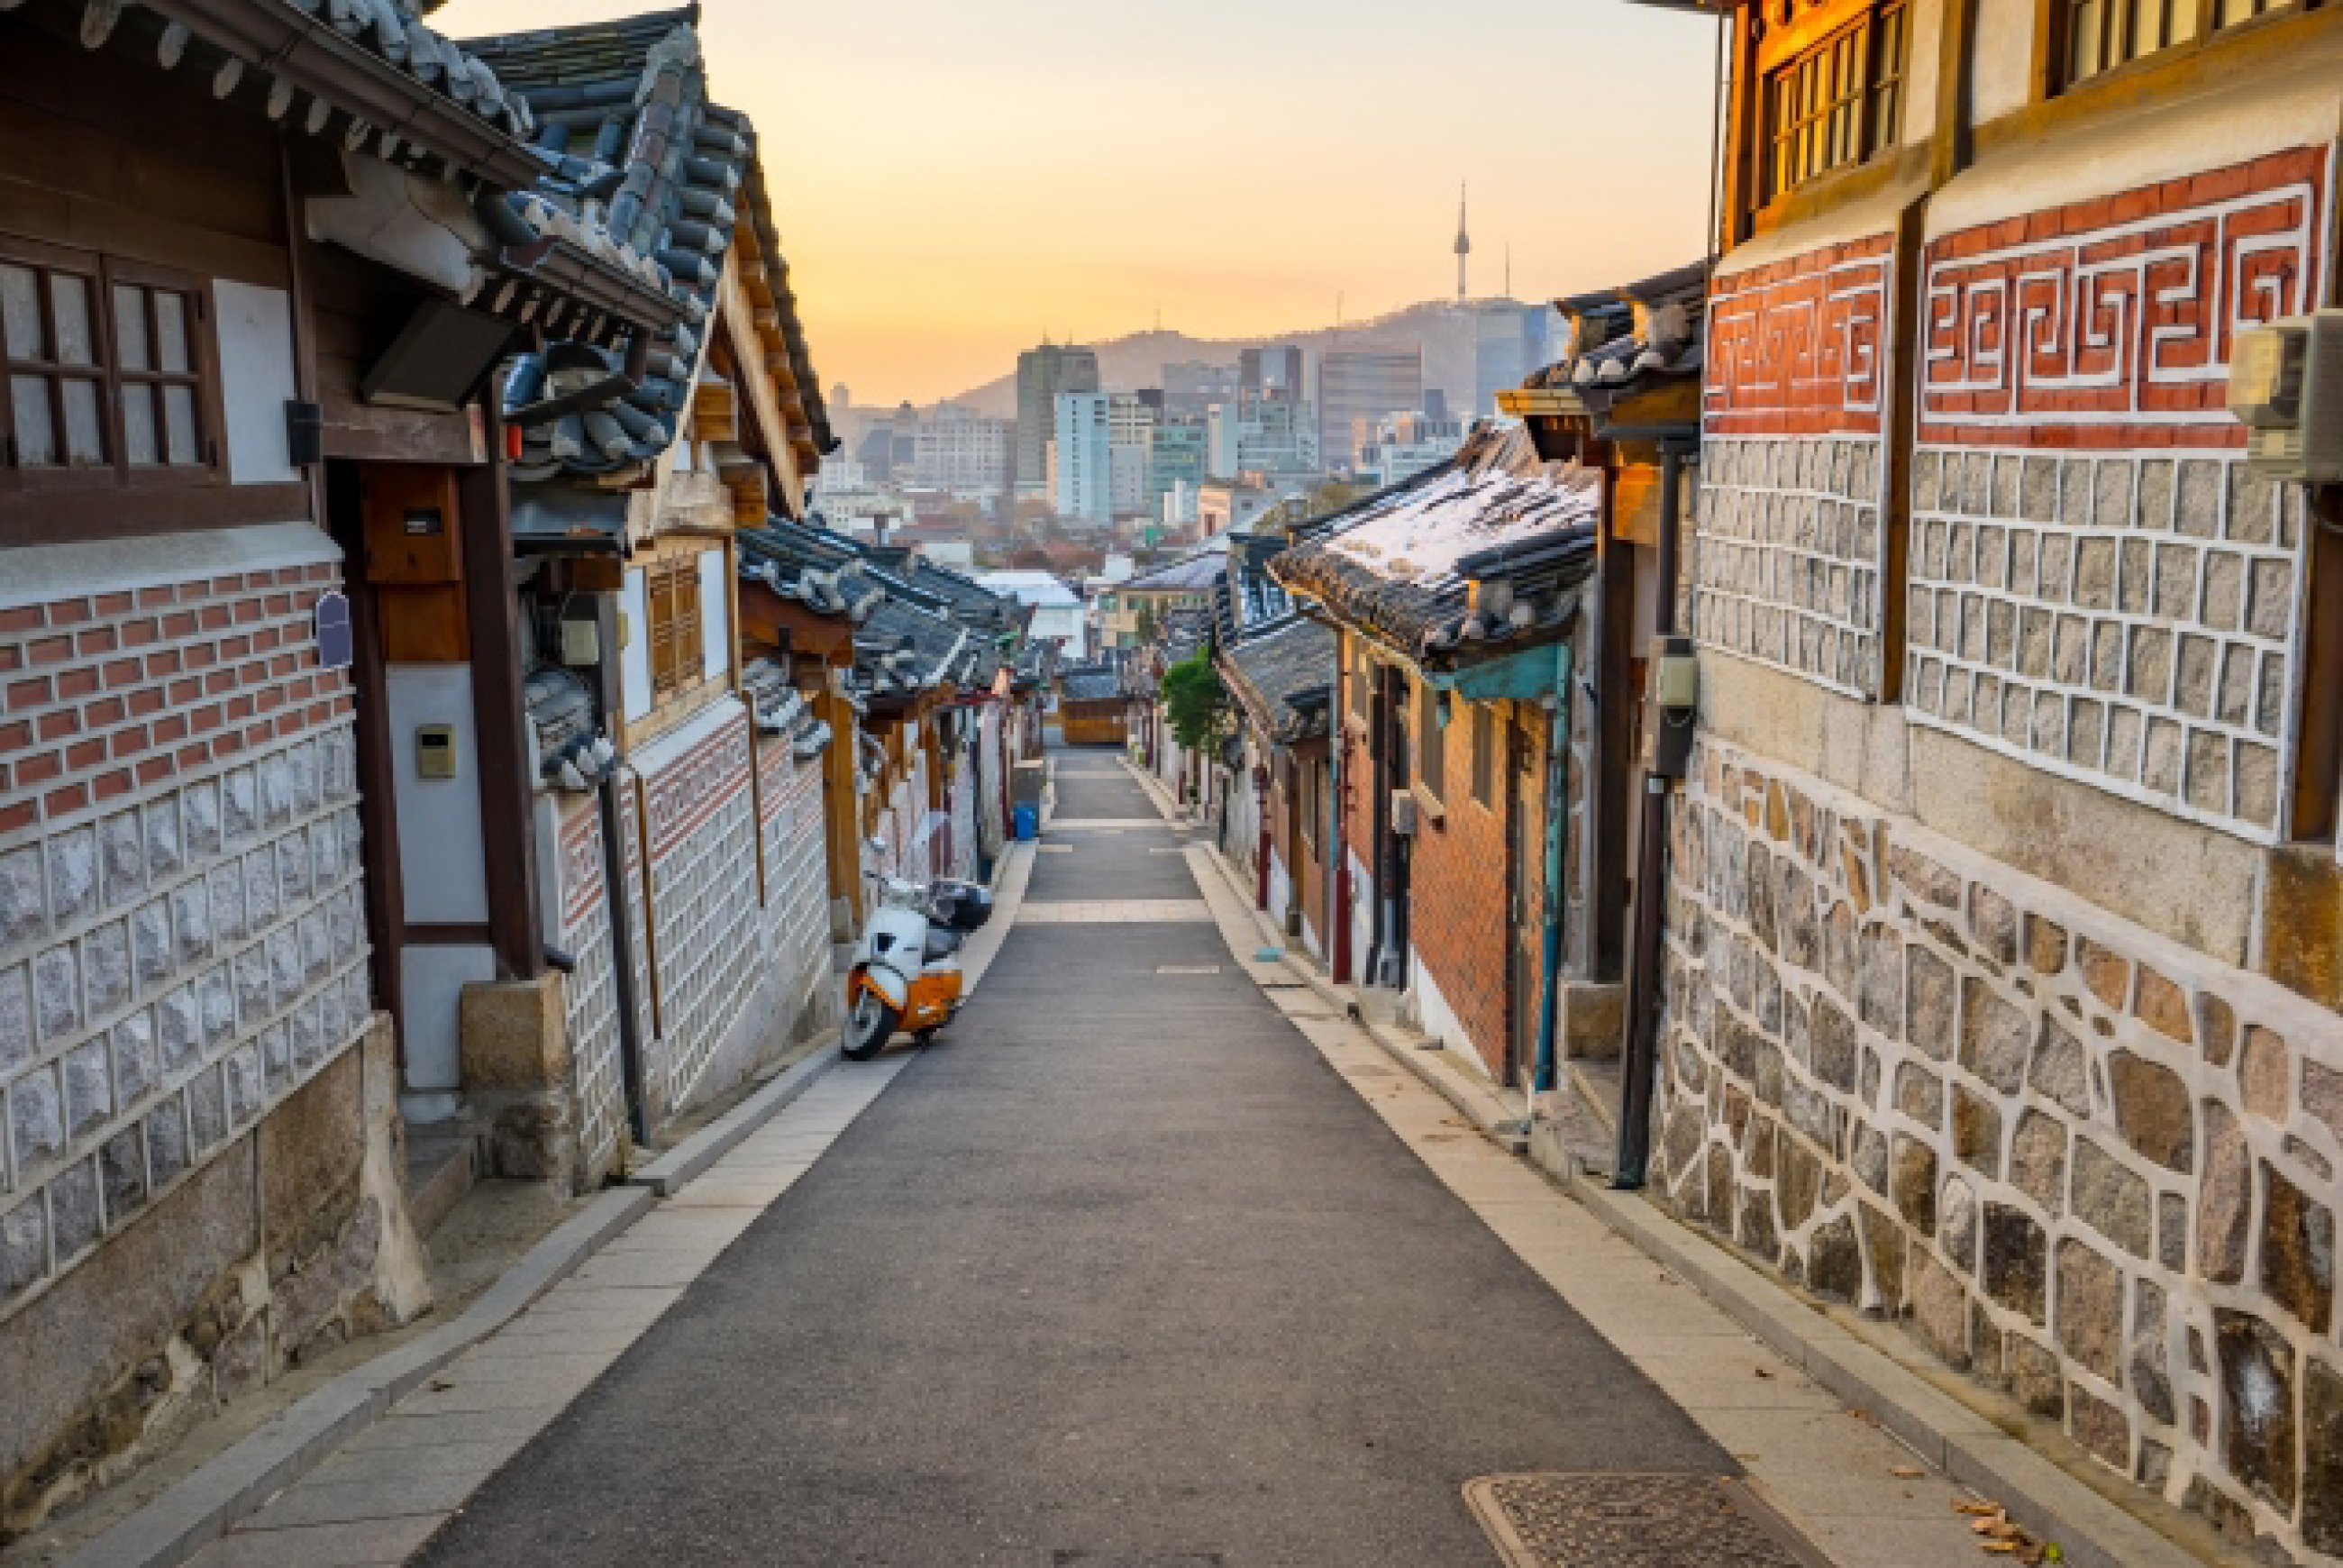 https://bubo.sk/uploads/galleries/7452/bukchon-hanok-historic-district-in-seoul-south-korea.jpg